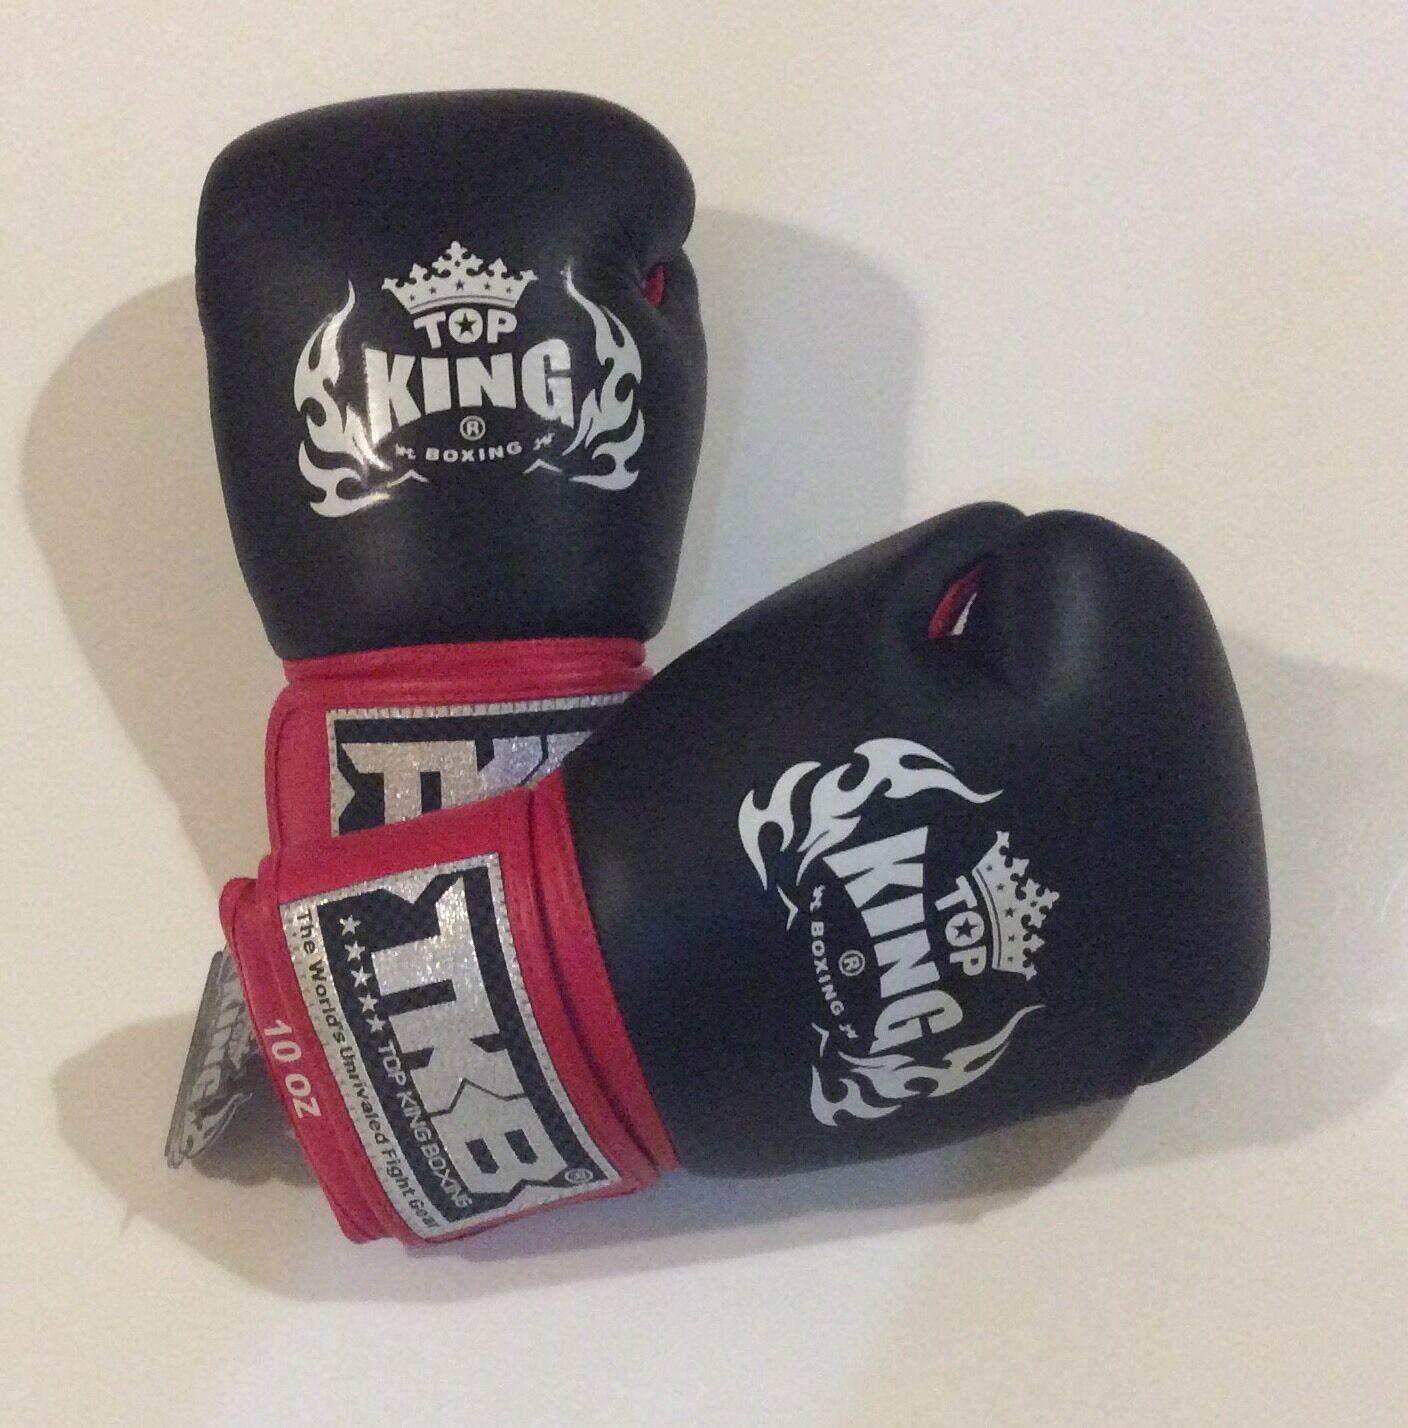 Top King TKBGAV Muay Thai/Boxing Gloves 10oz Blk/Weiß/ROT